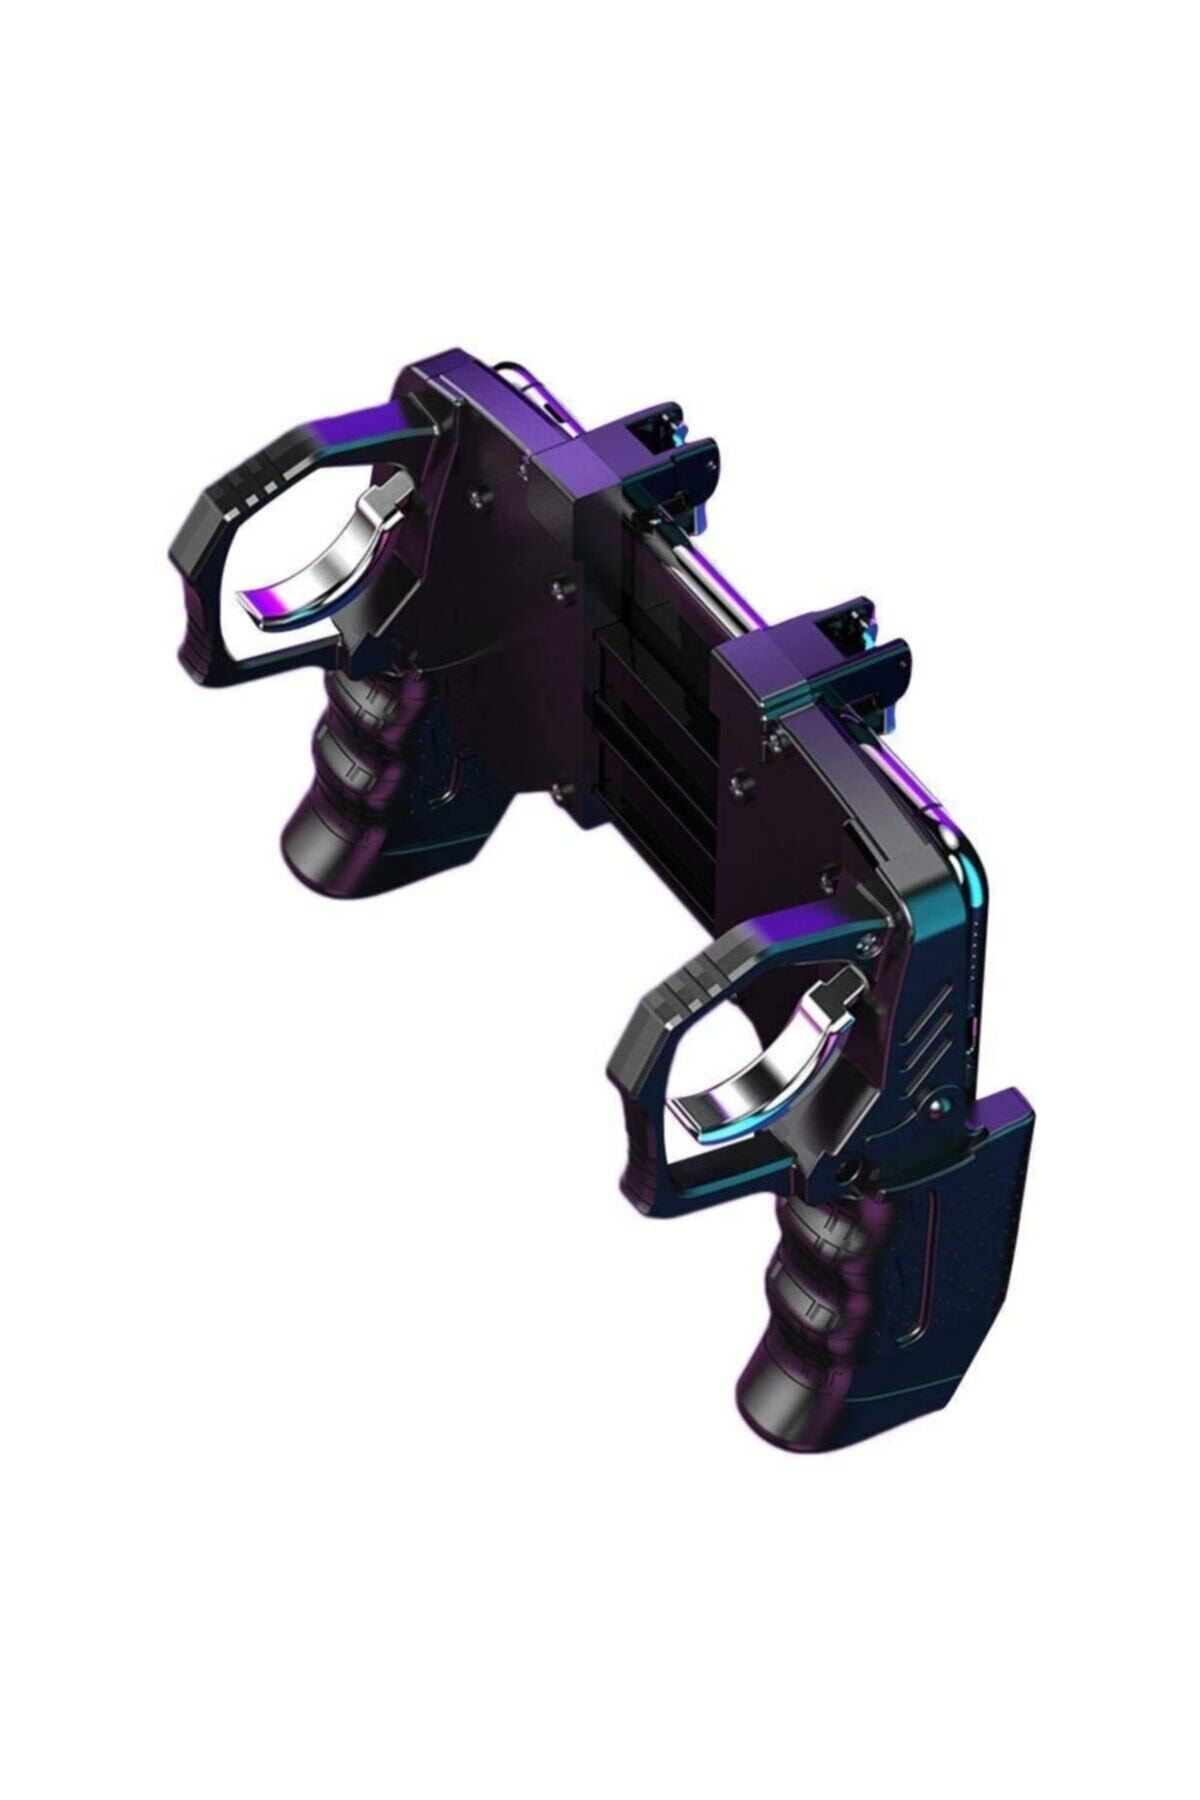 Aydurmaz Silah Kabzası Tasarım Pubg Mobil Game Oyun Aparatı Konsolu 1